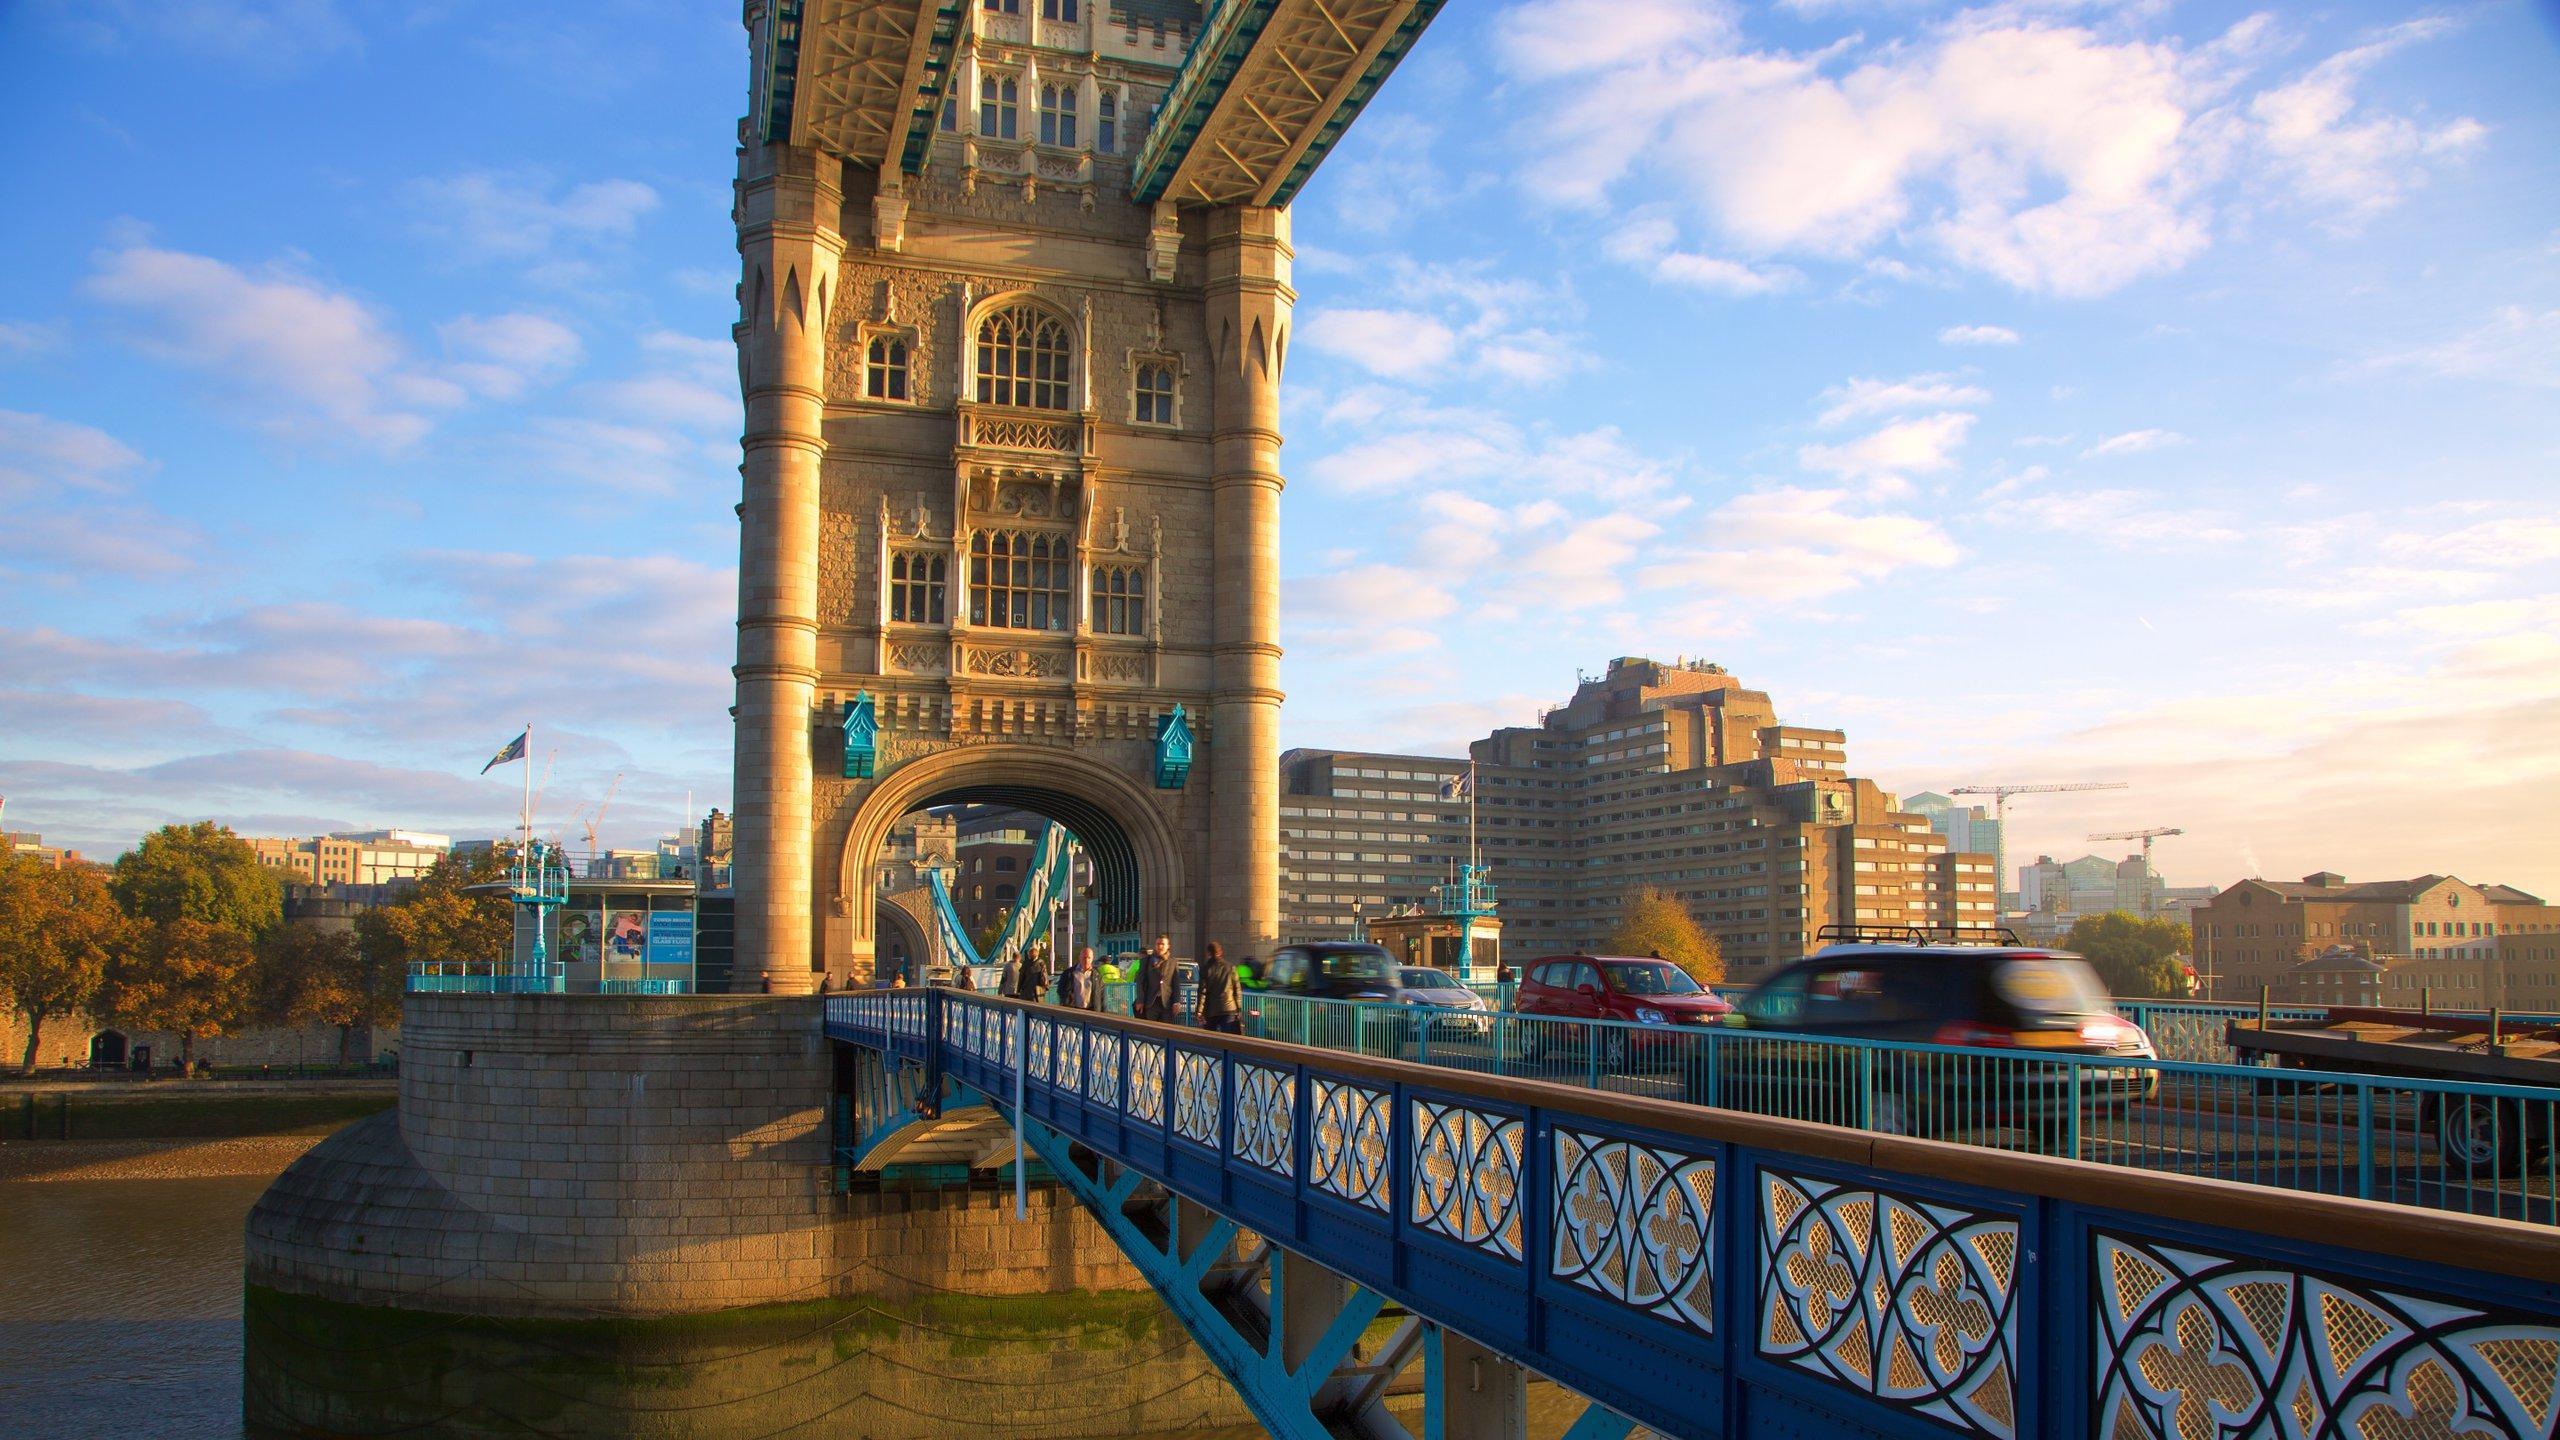 Tower Hamlets, London, England, United Kingdom